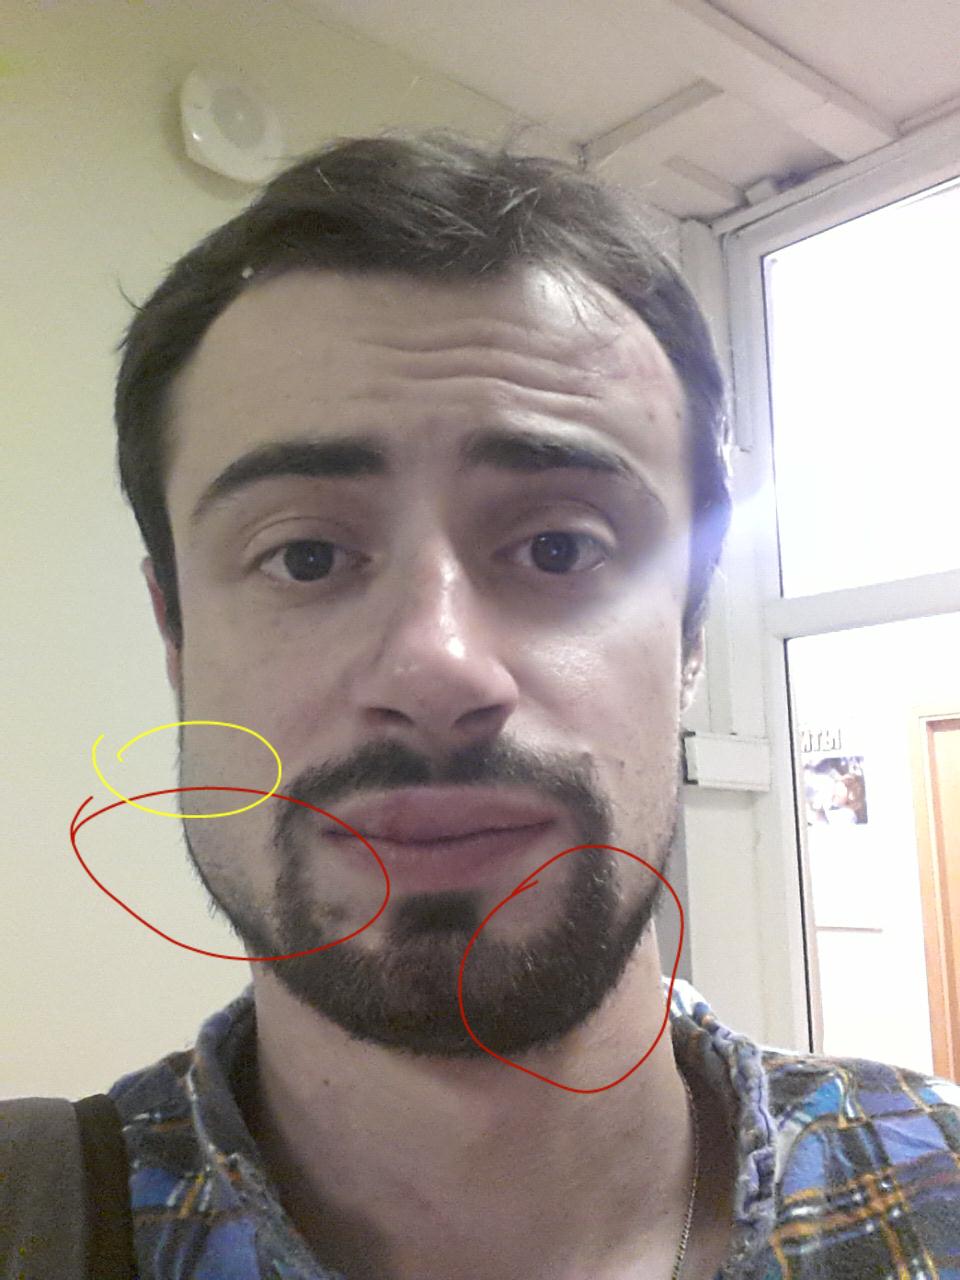 перелом челюсти фото